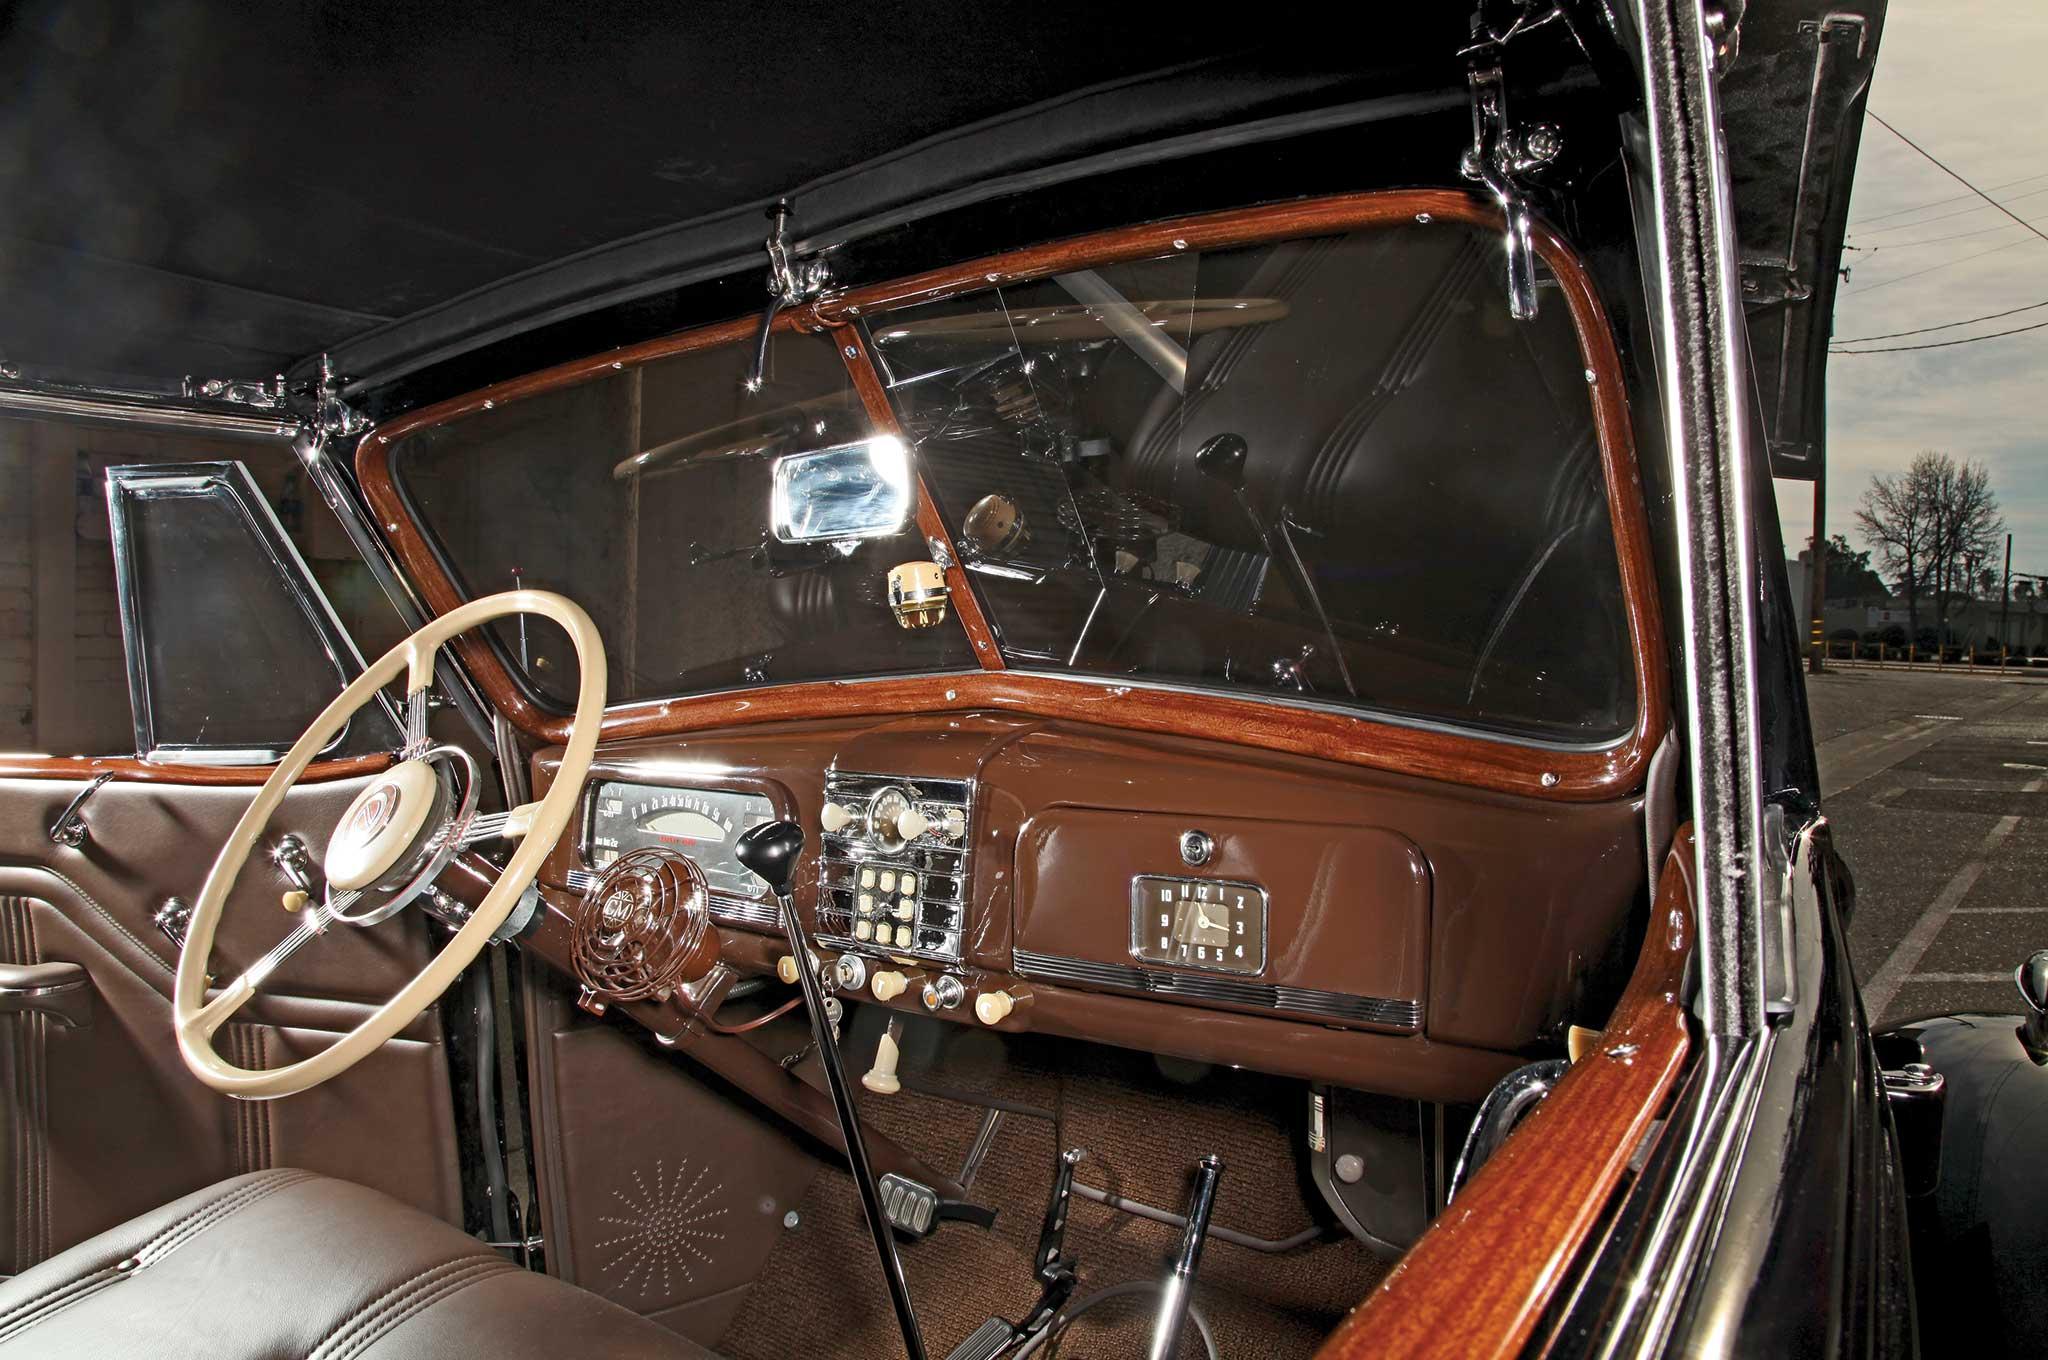 009 1938 chevrolet cabriolet windshield